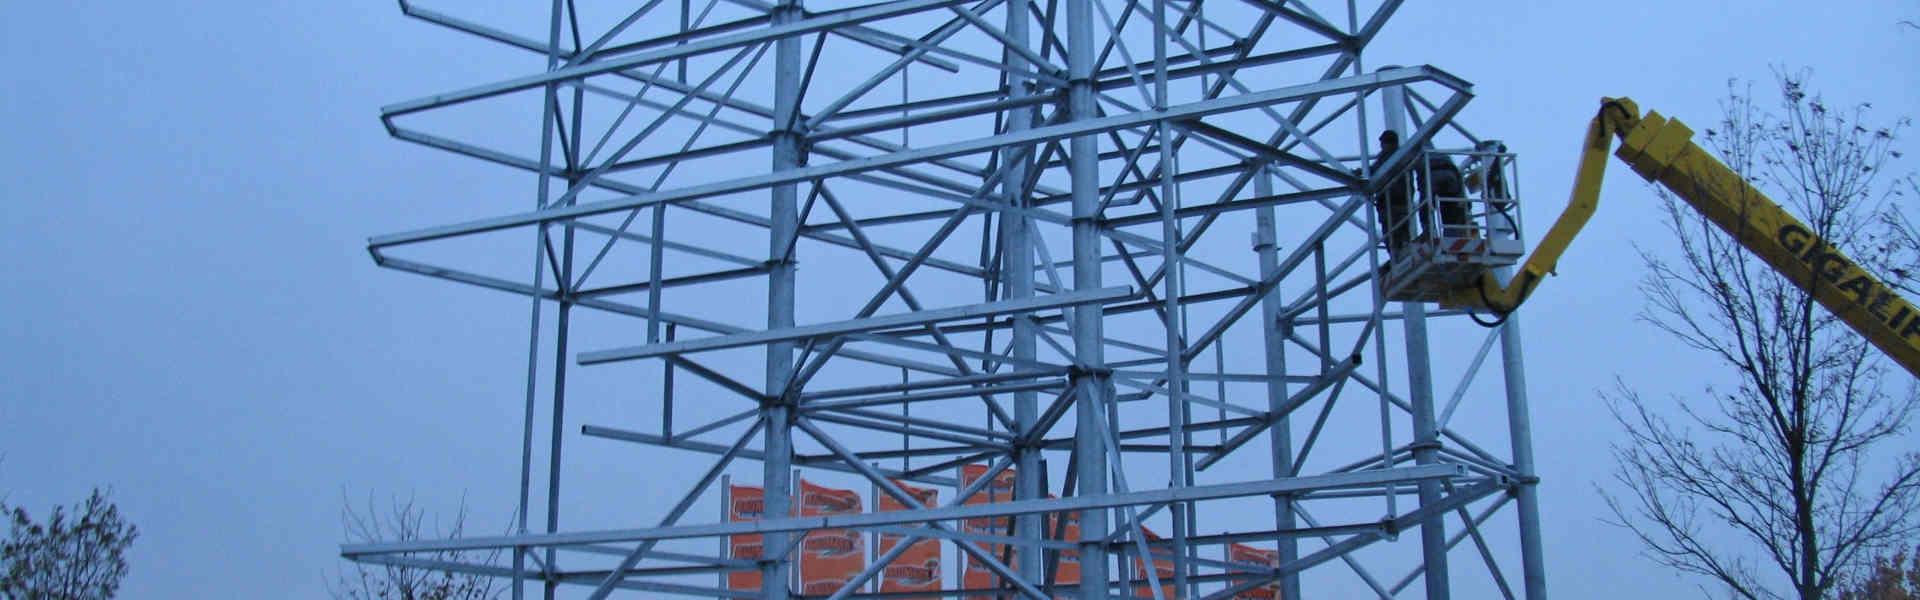 Konstrukta-Metallbau-Konstruktion-Werbeanlage-1920x600